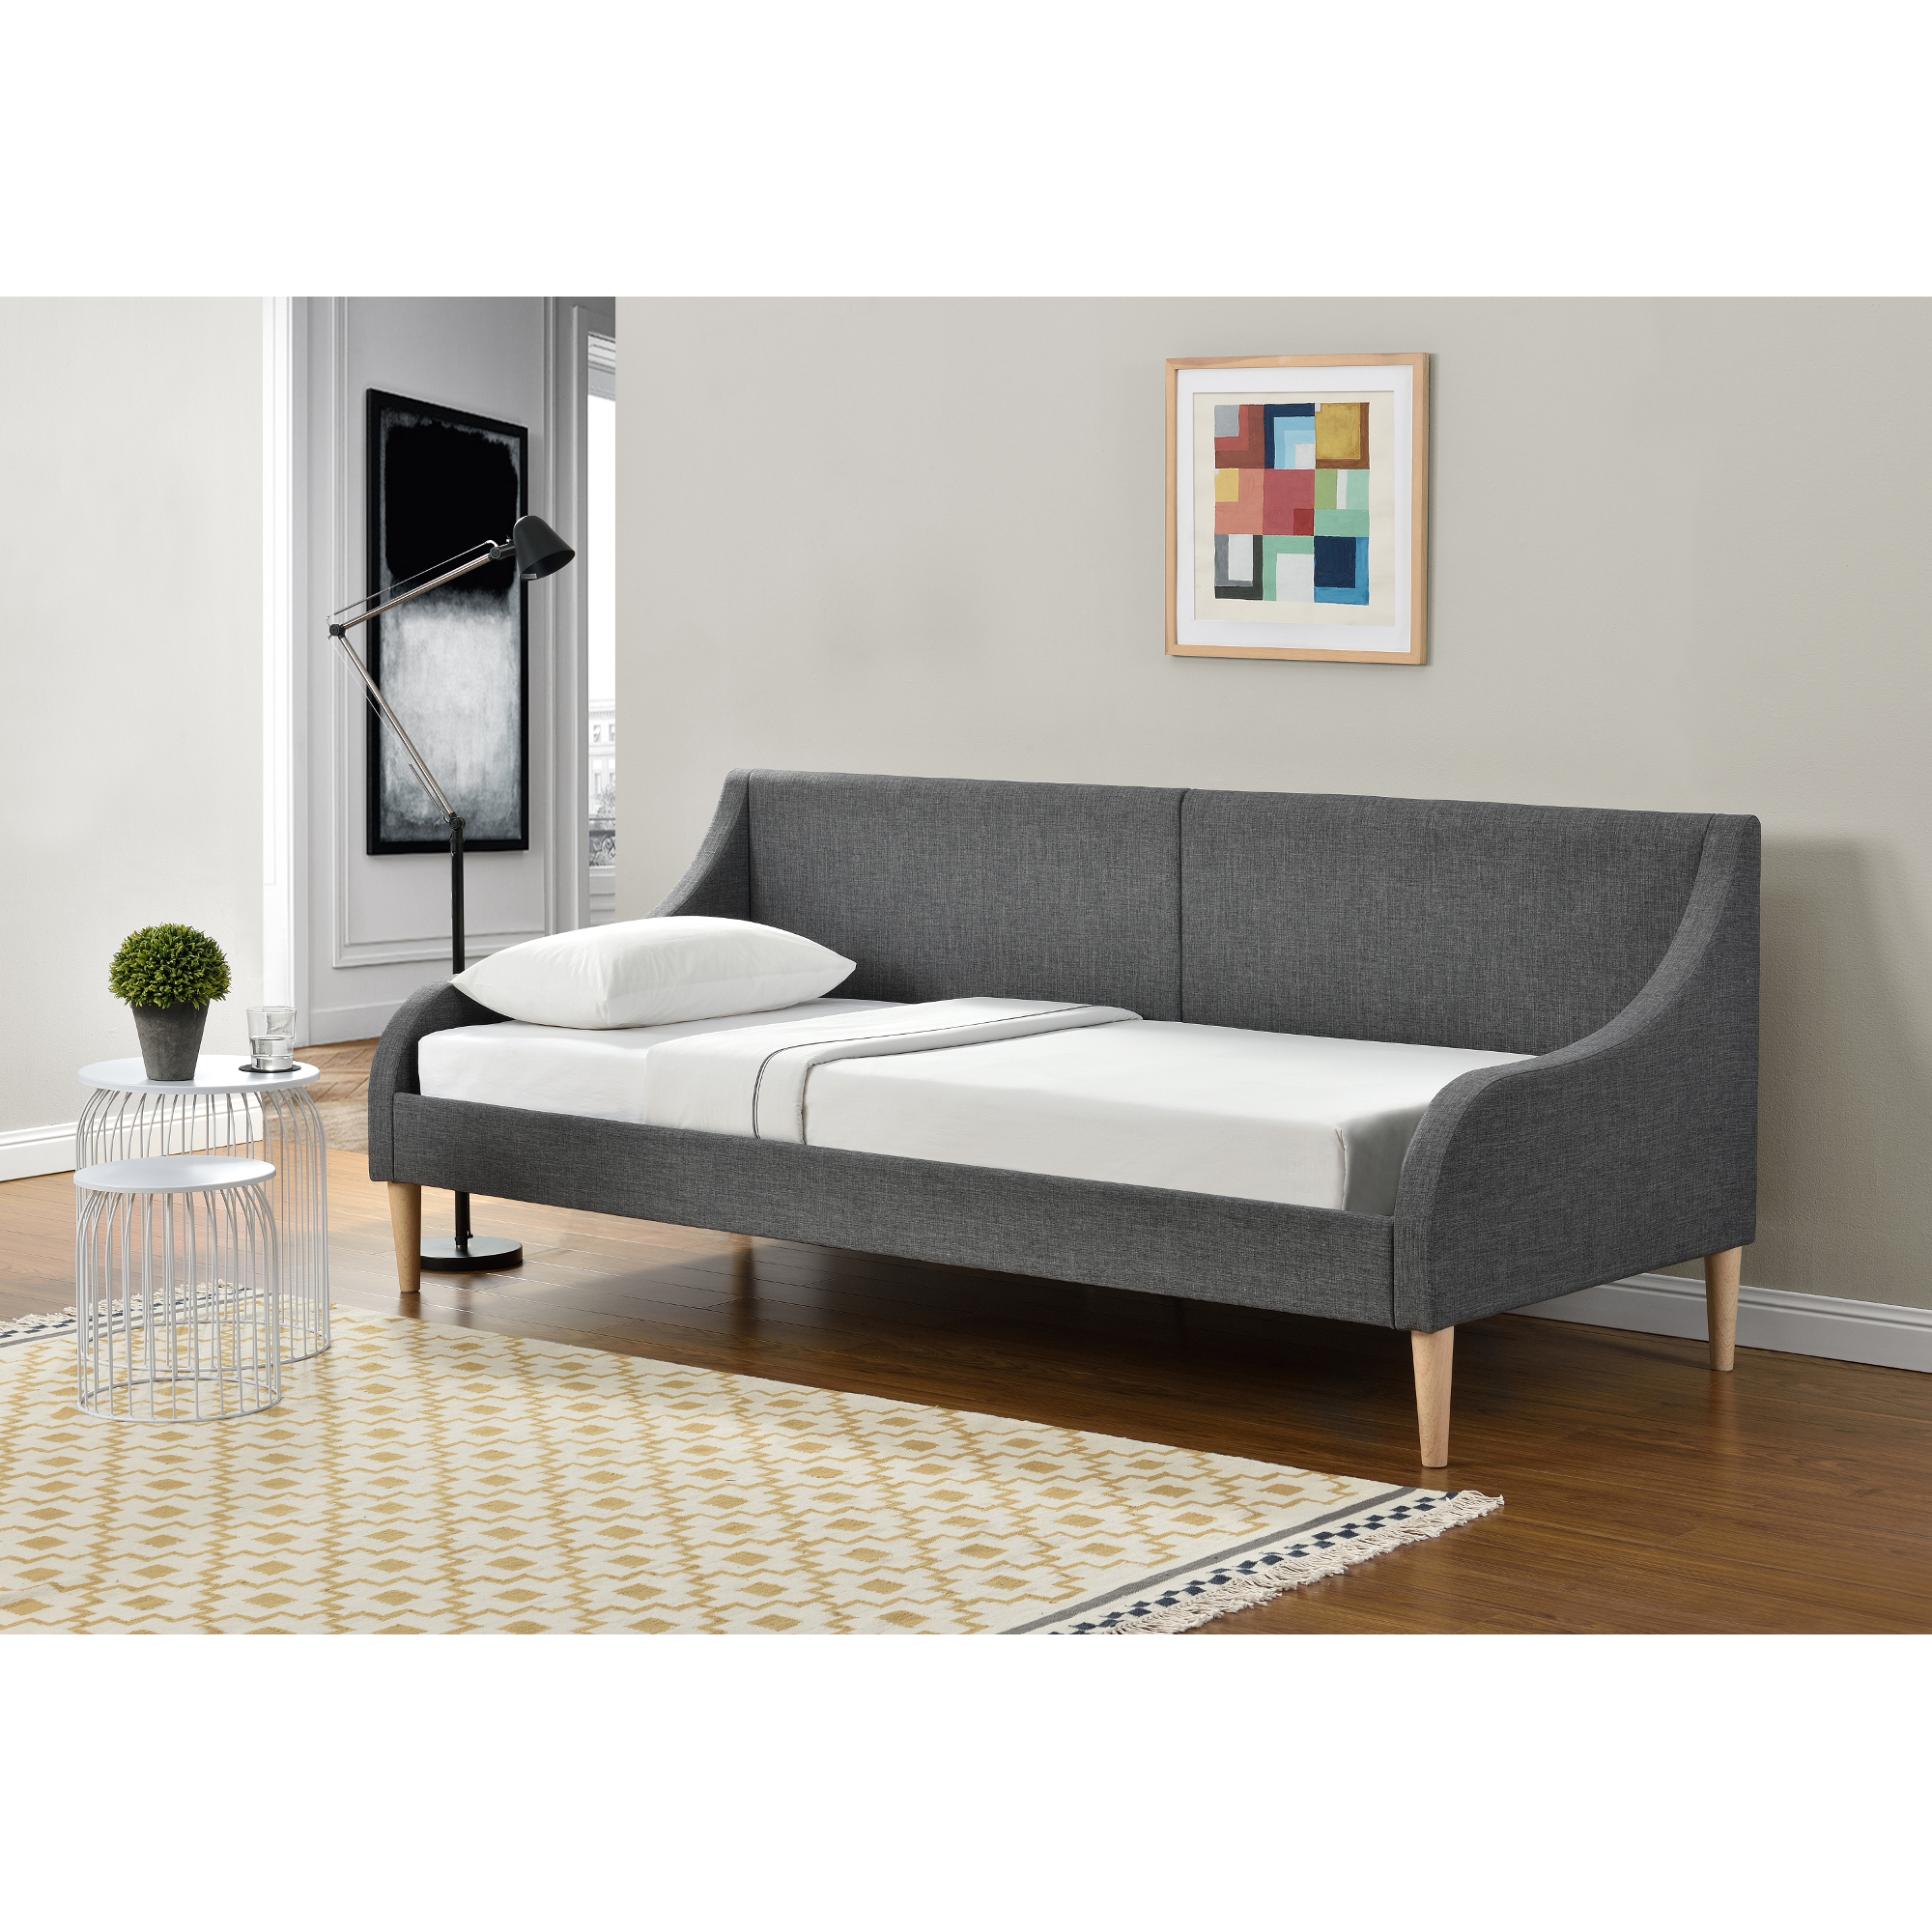 en.casa] Tagesbett mit Matratze 90 x 200 cm Schlafsofa Bett Textil ...